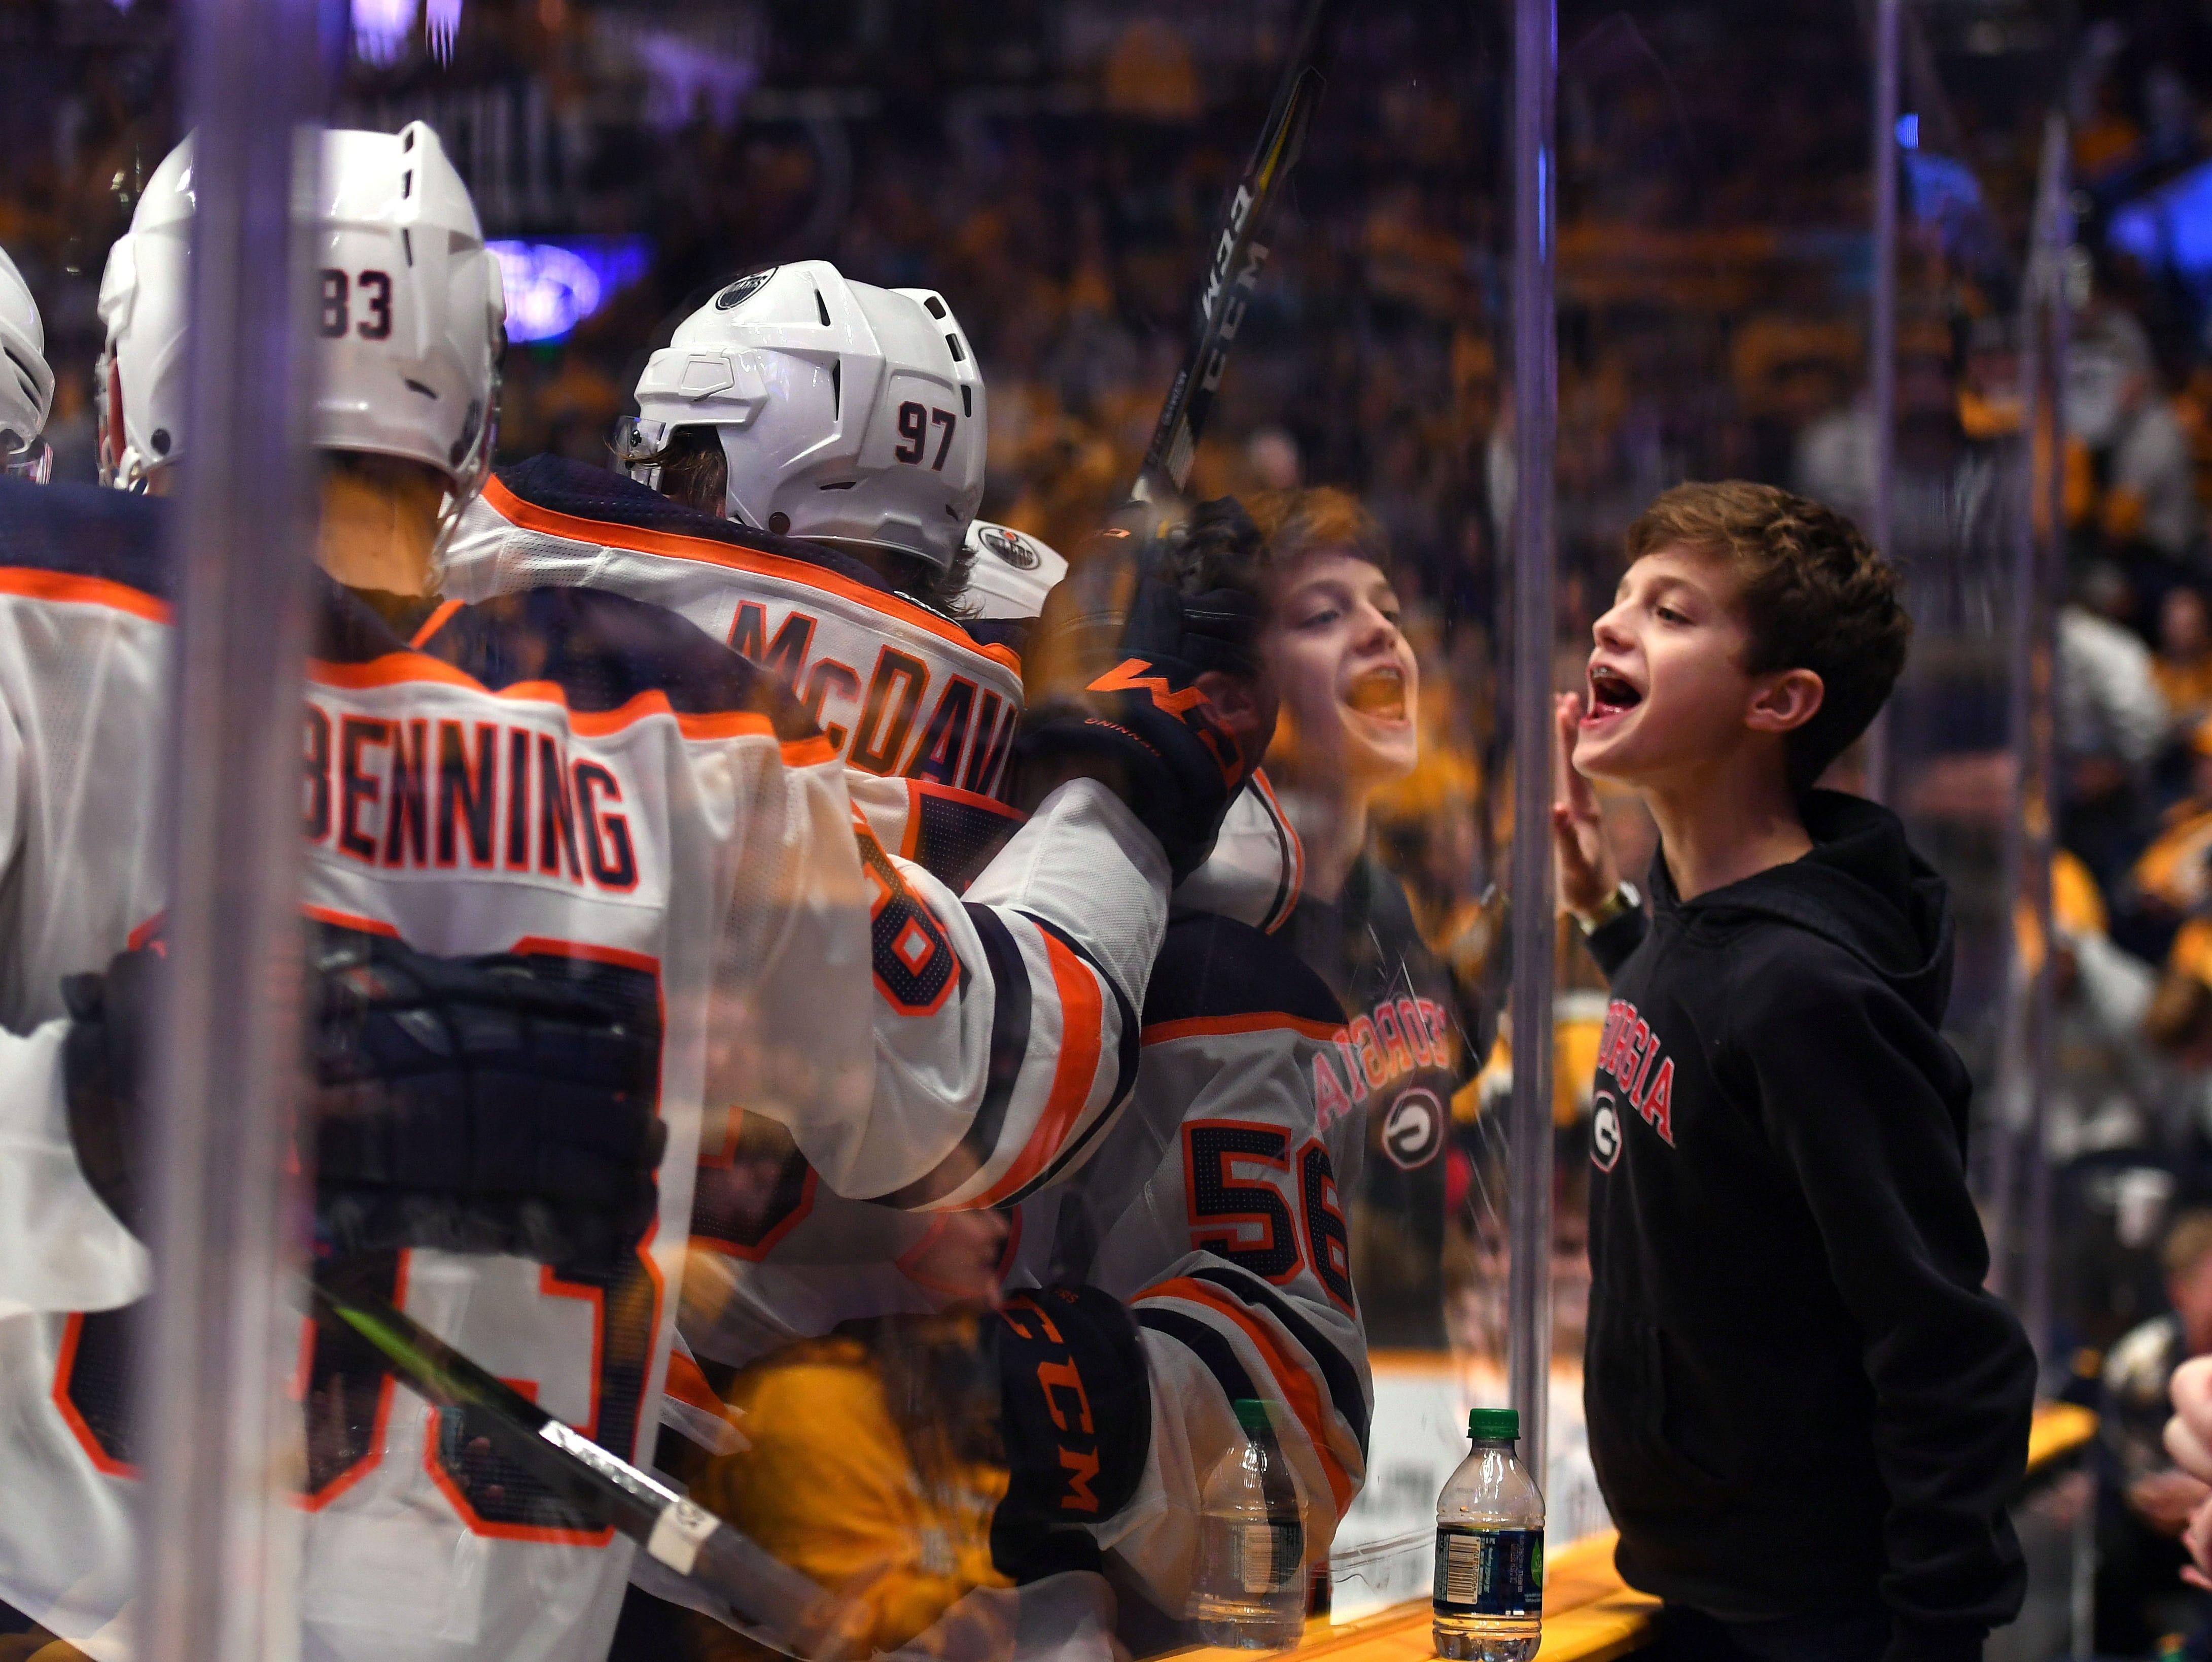 Oct. 27: Edmonton Oilers players celebrate after a goal by Connor McDavid (97) against the Nashville Predators at Bridgestone Arena.